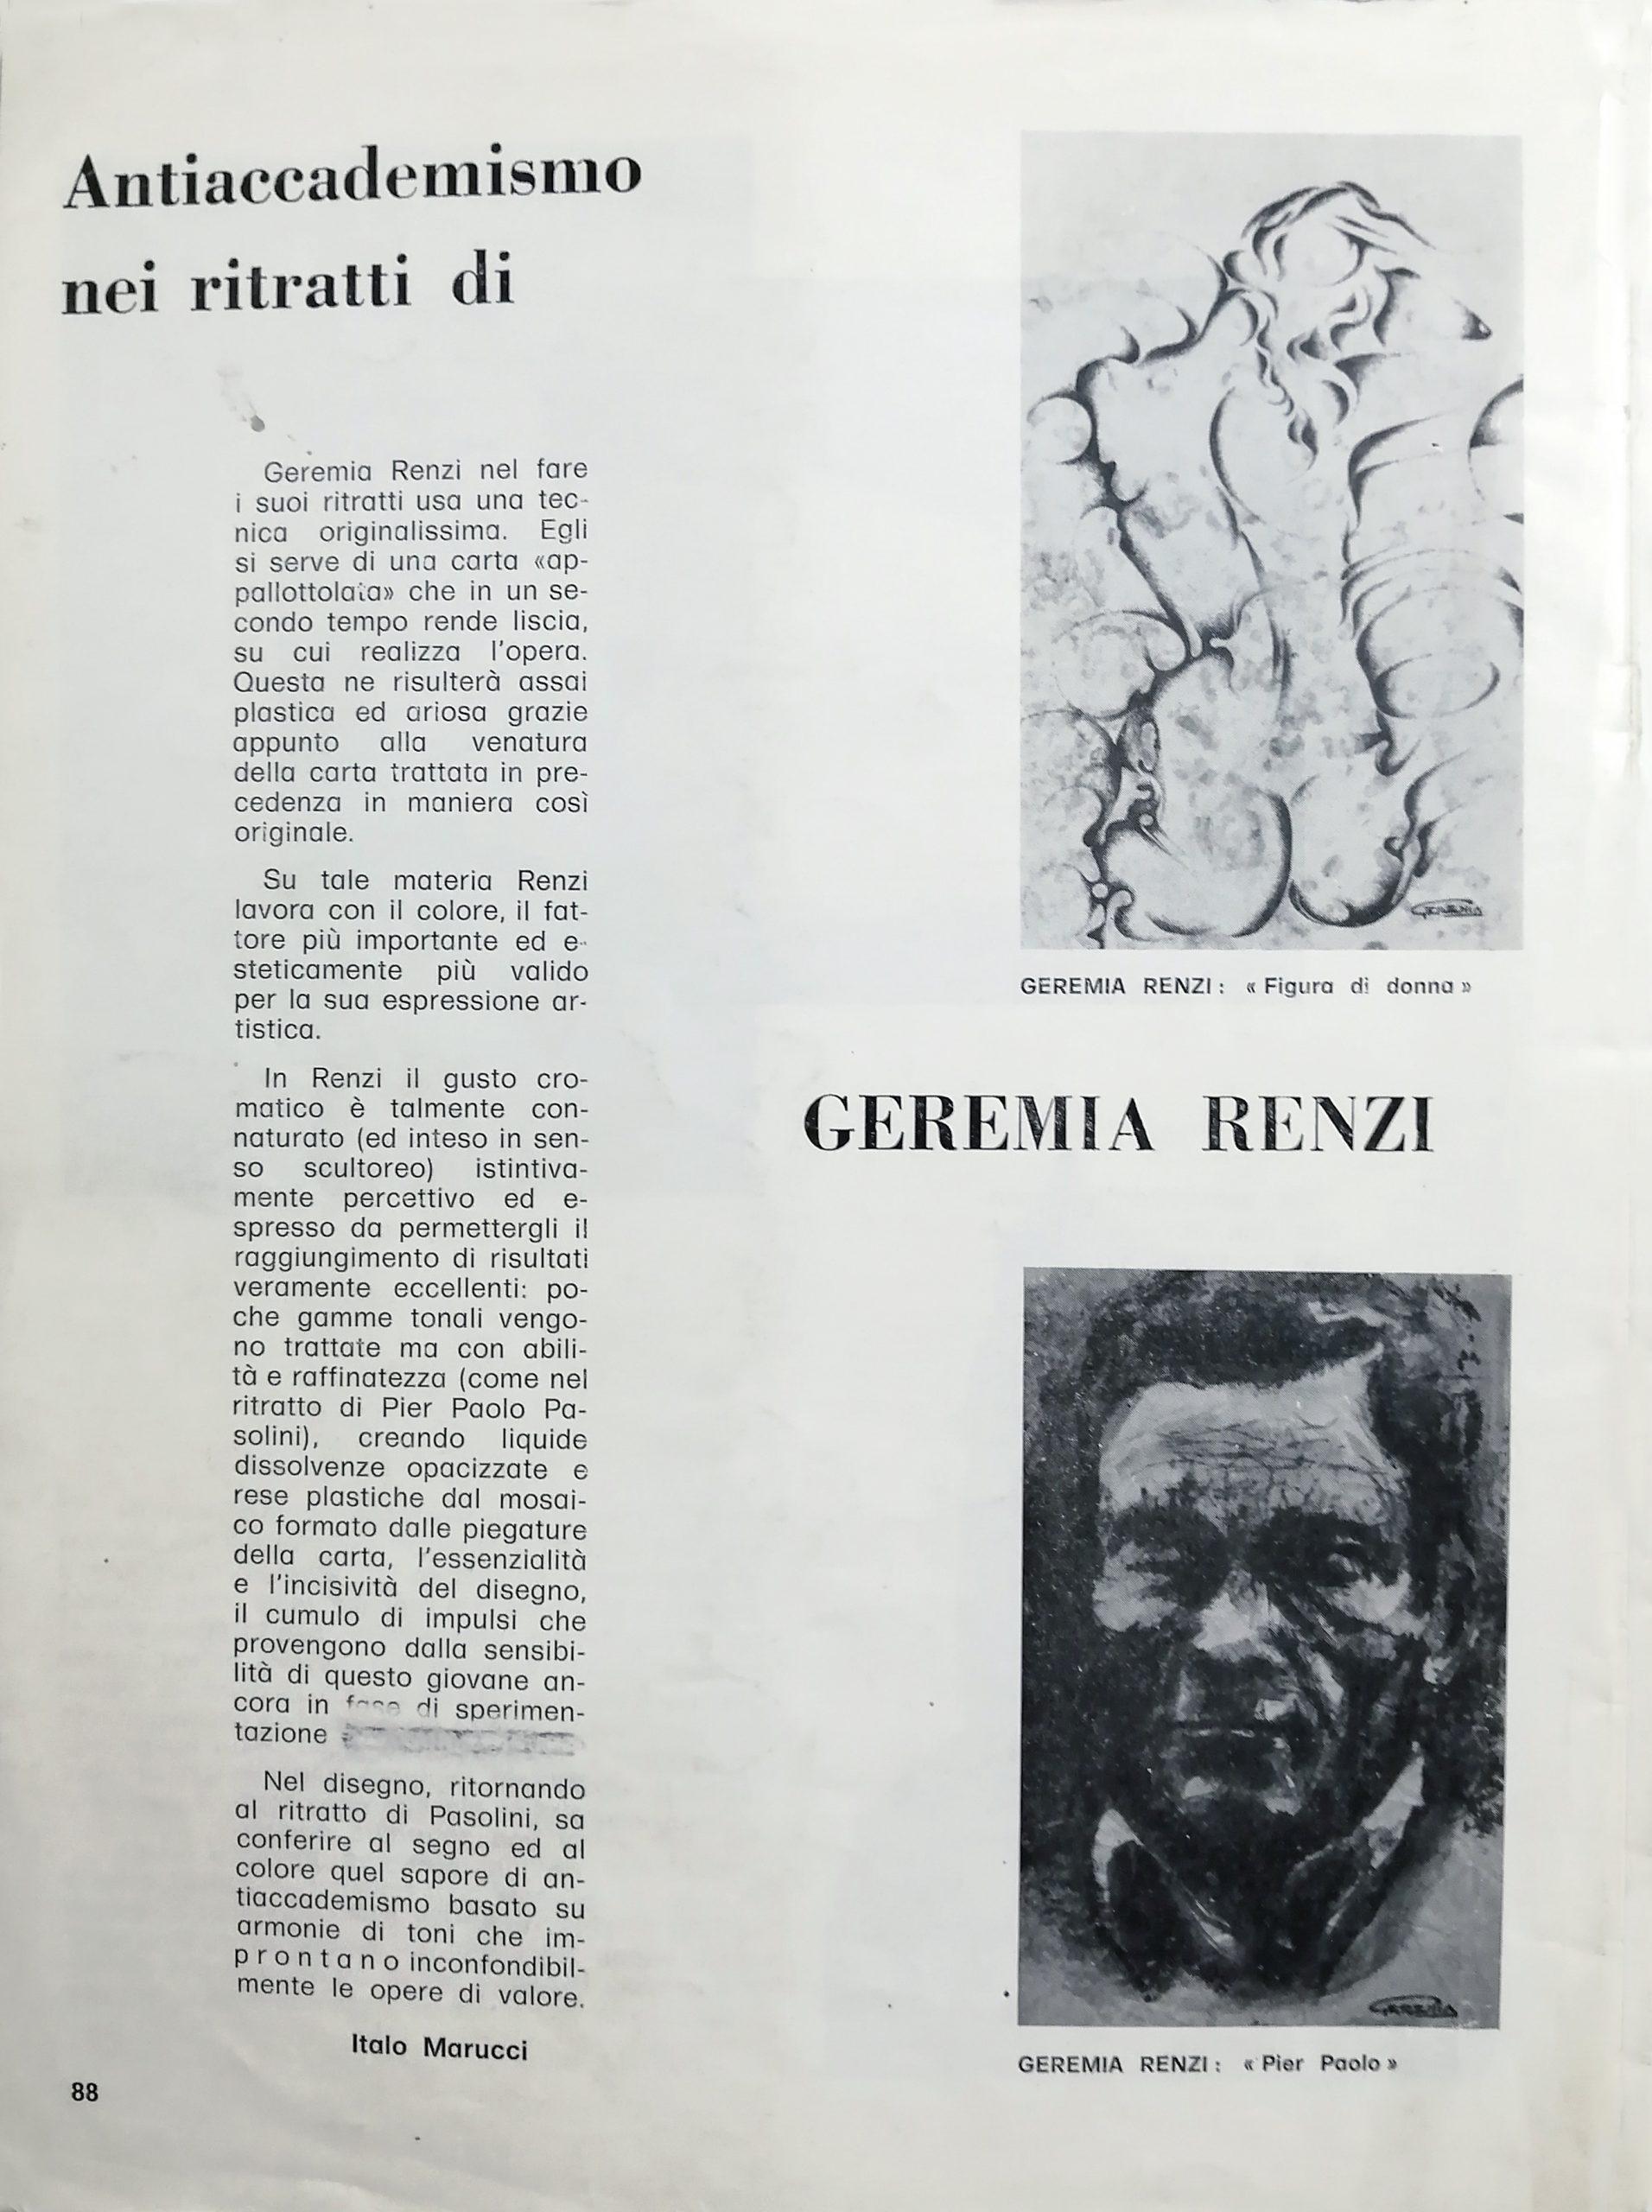 1978 Koinè periodico immagine scaled - Bibliography/ Catalogues